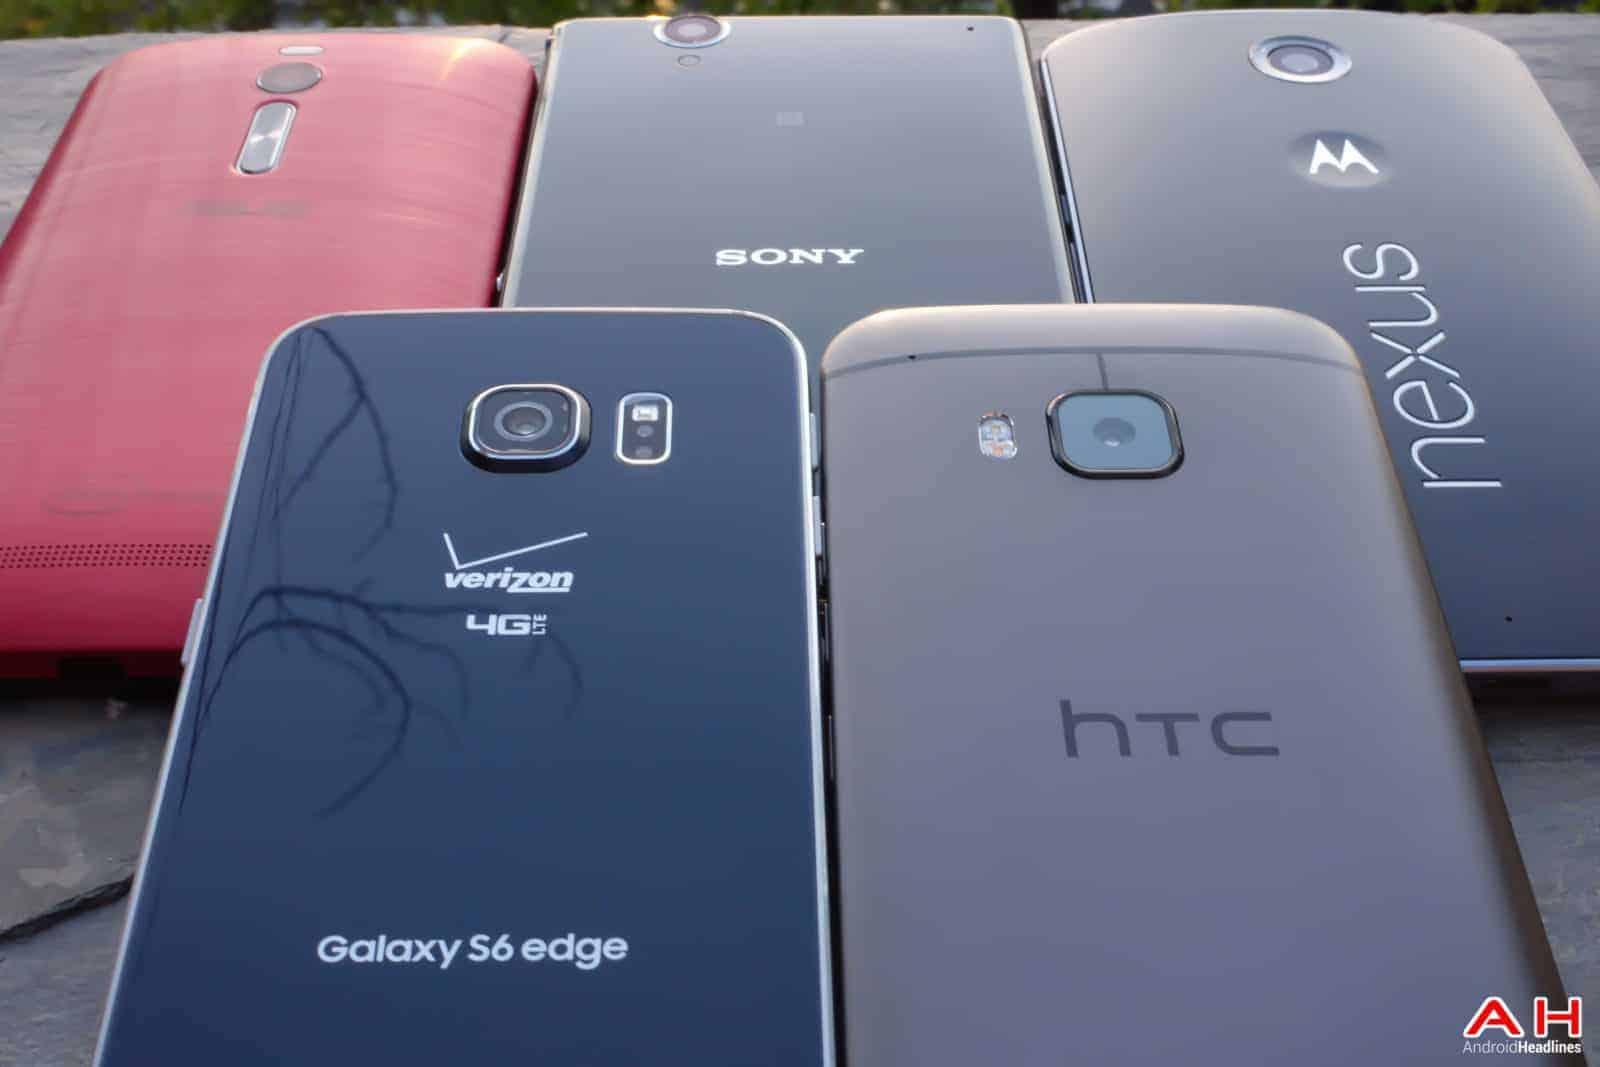 AH AH Android Samrtphones Nexus Samsung Galaxy S6 HTC One M9 Sony OEM logos-21 May 3rd Batch 2-3